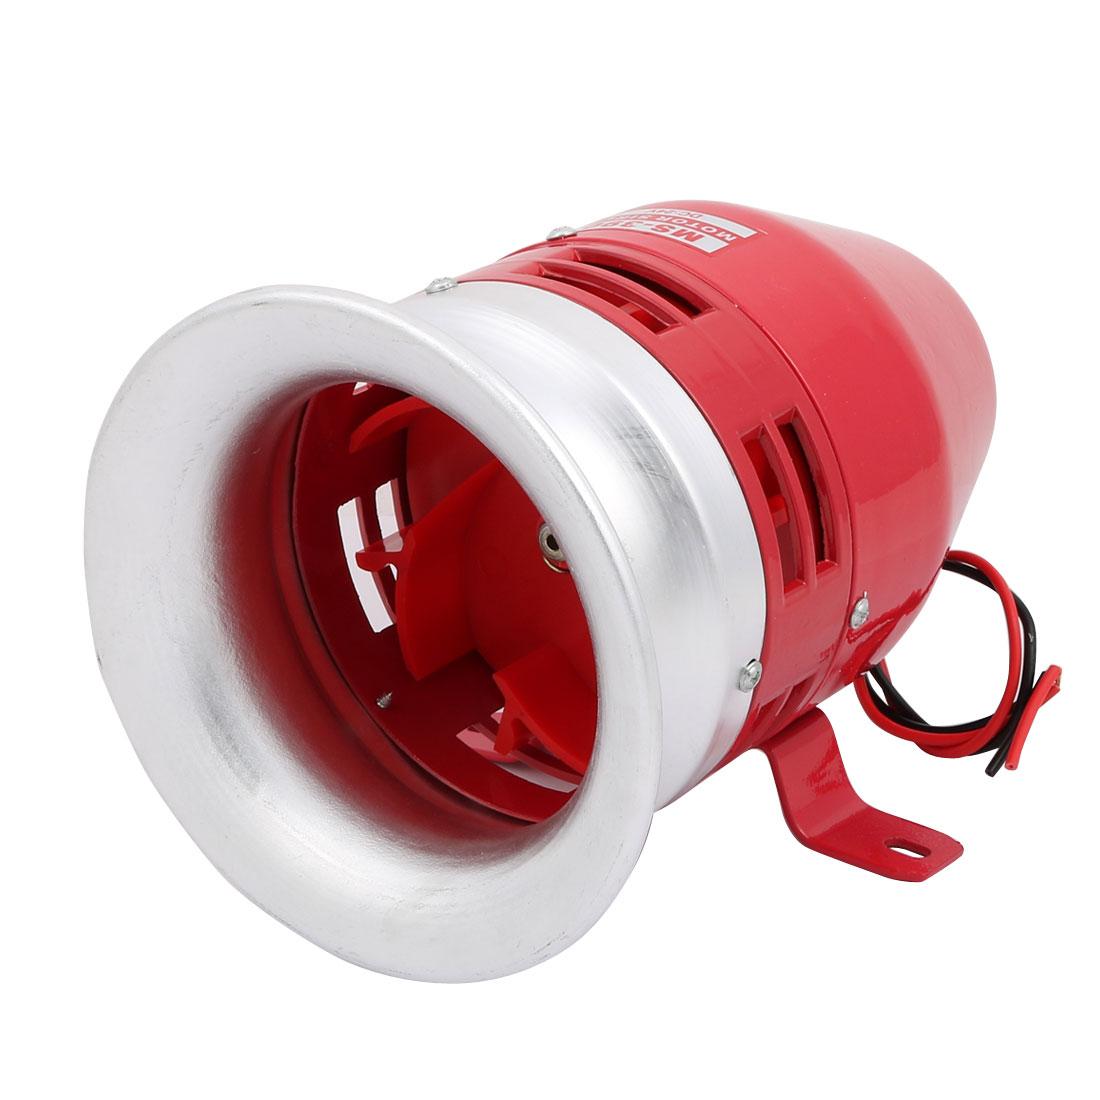 DC 24V MS-390 Metal Safety Motor Buzzer Siren Industrial Alarm Sound Red